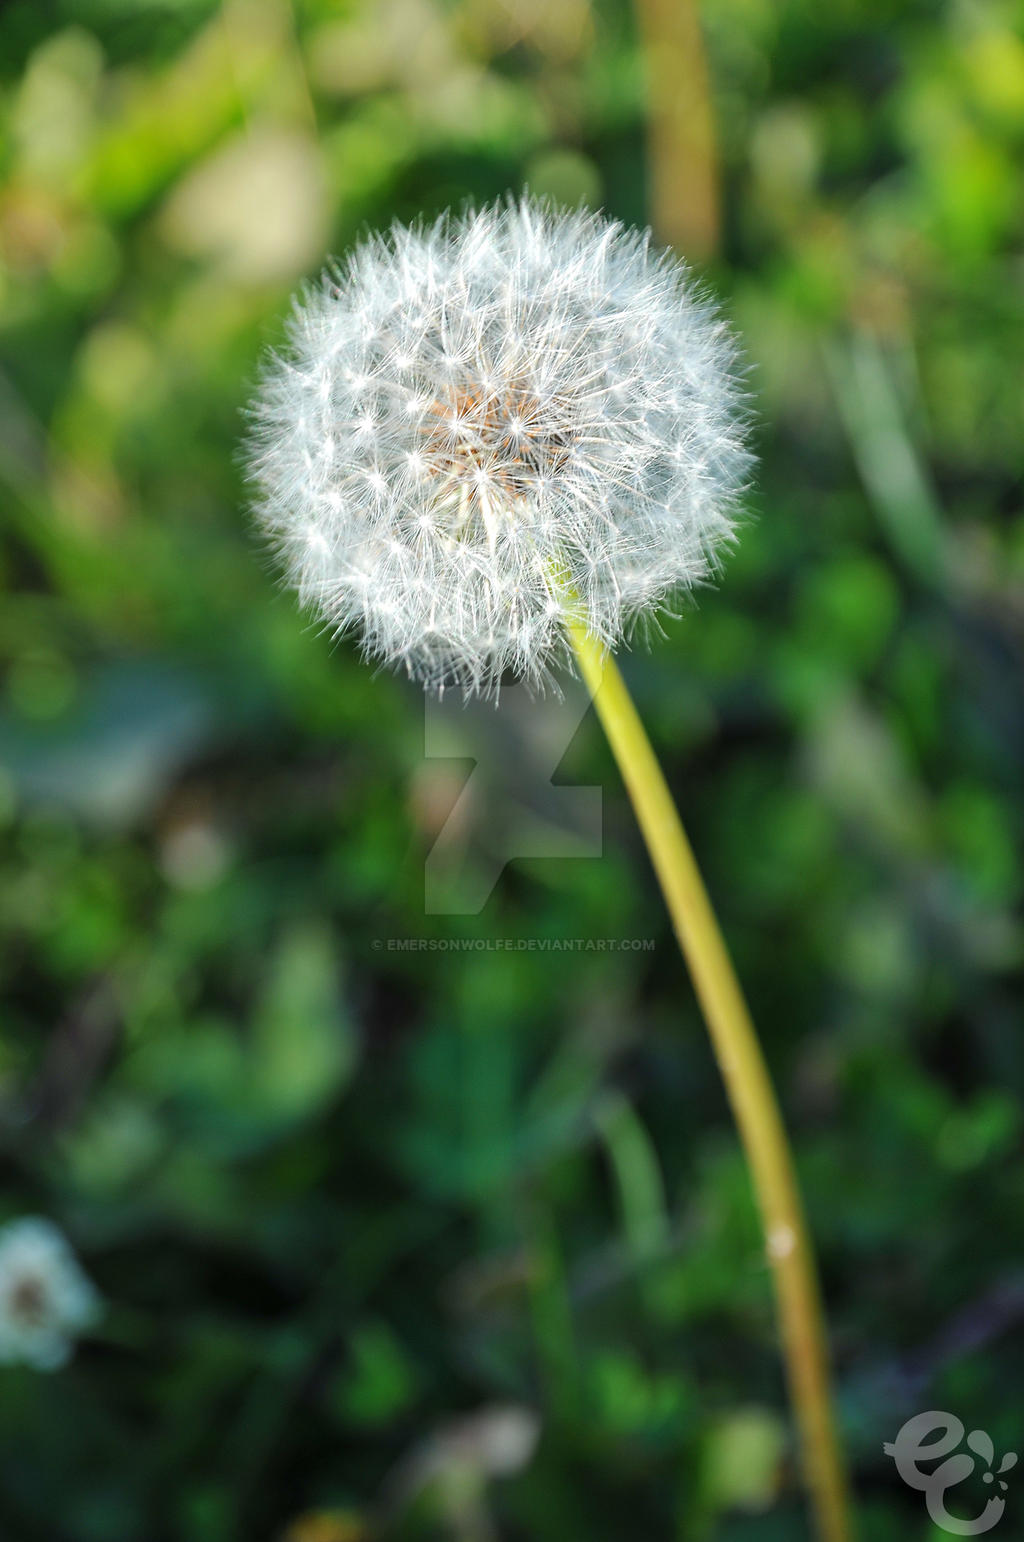 Dandelion by EmersonWolfe